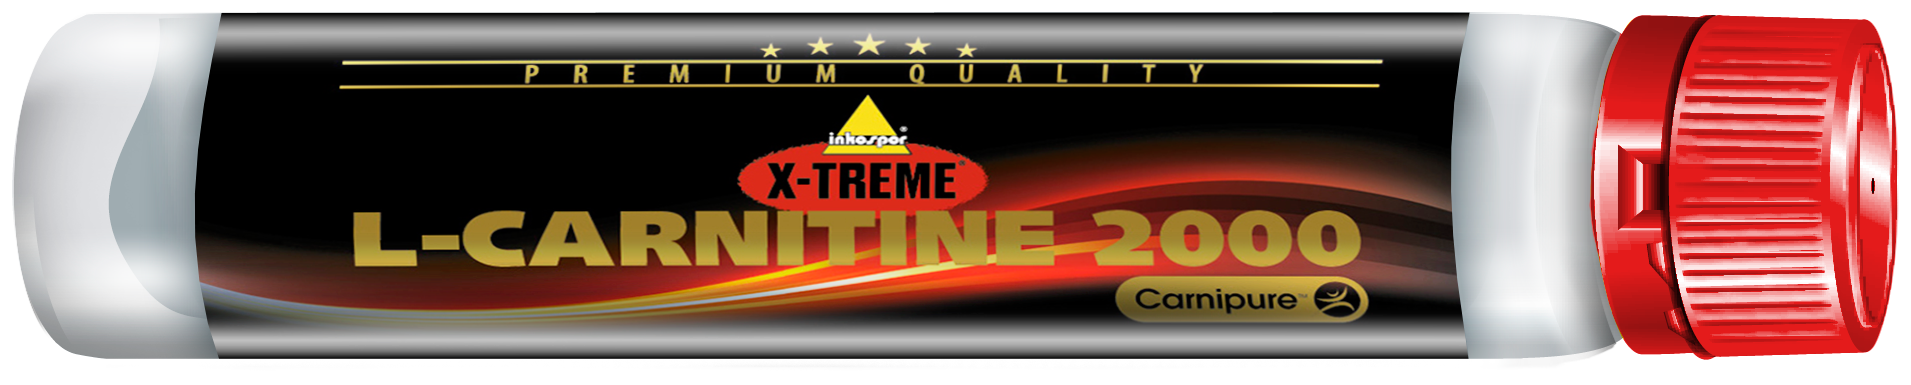 inkospor X-TREME L-Carnitine 2000 Ampul